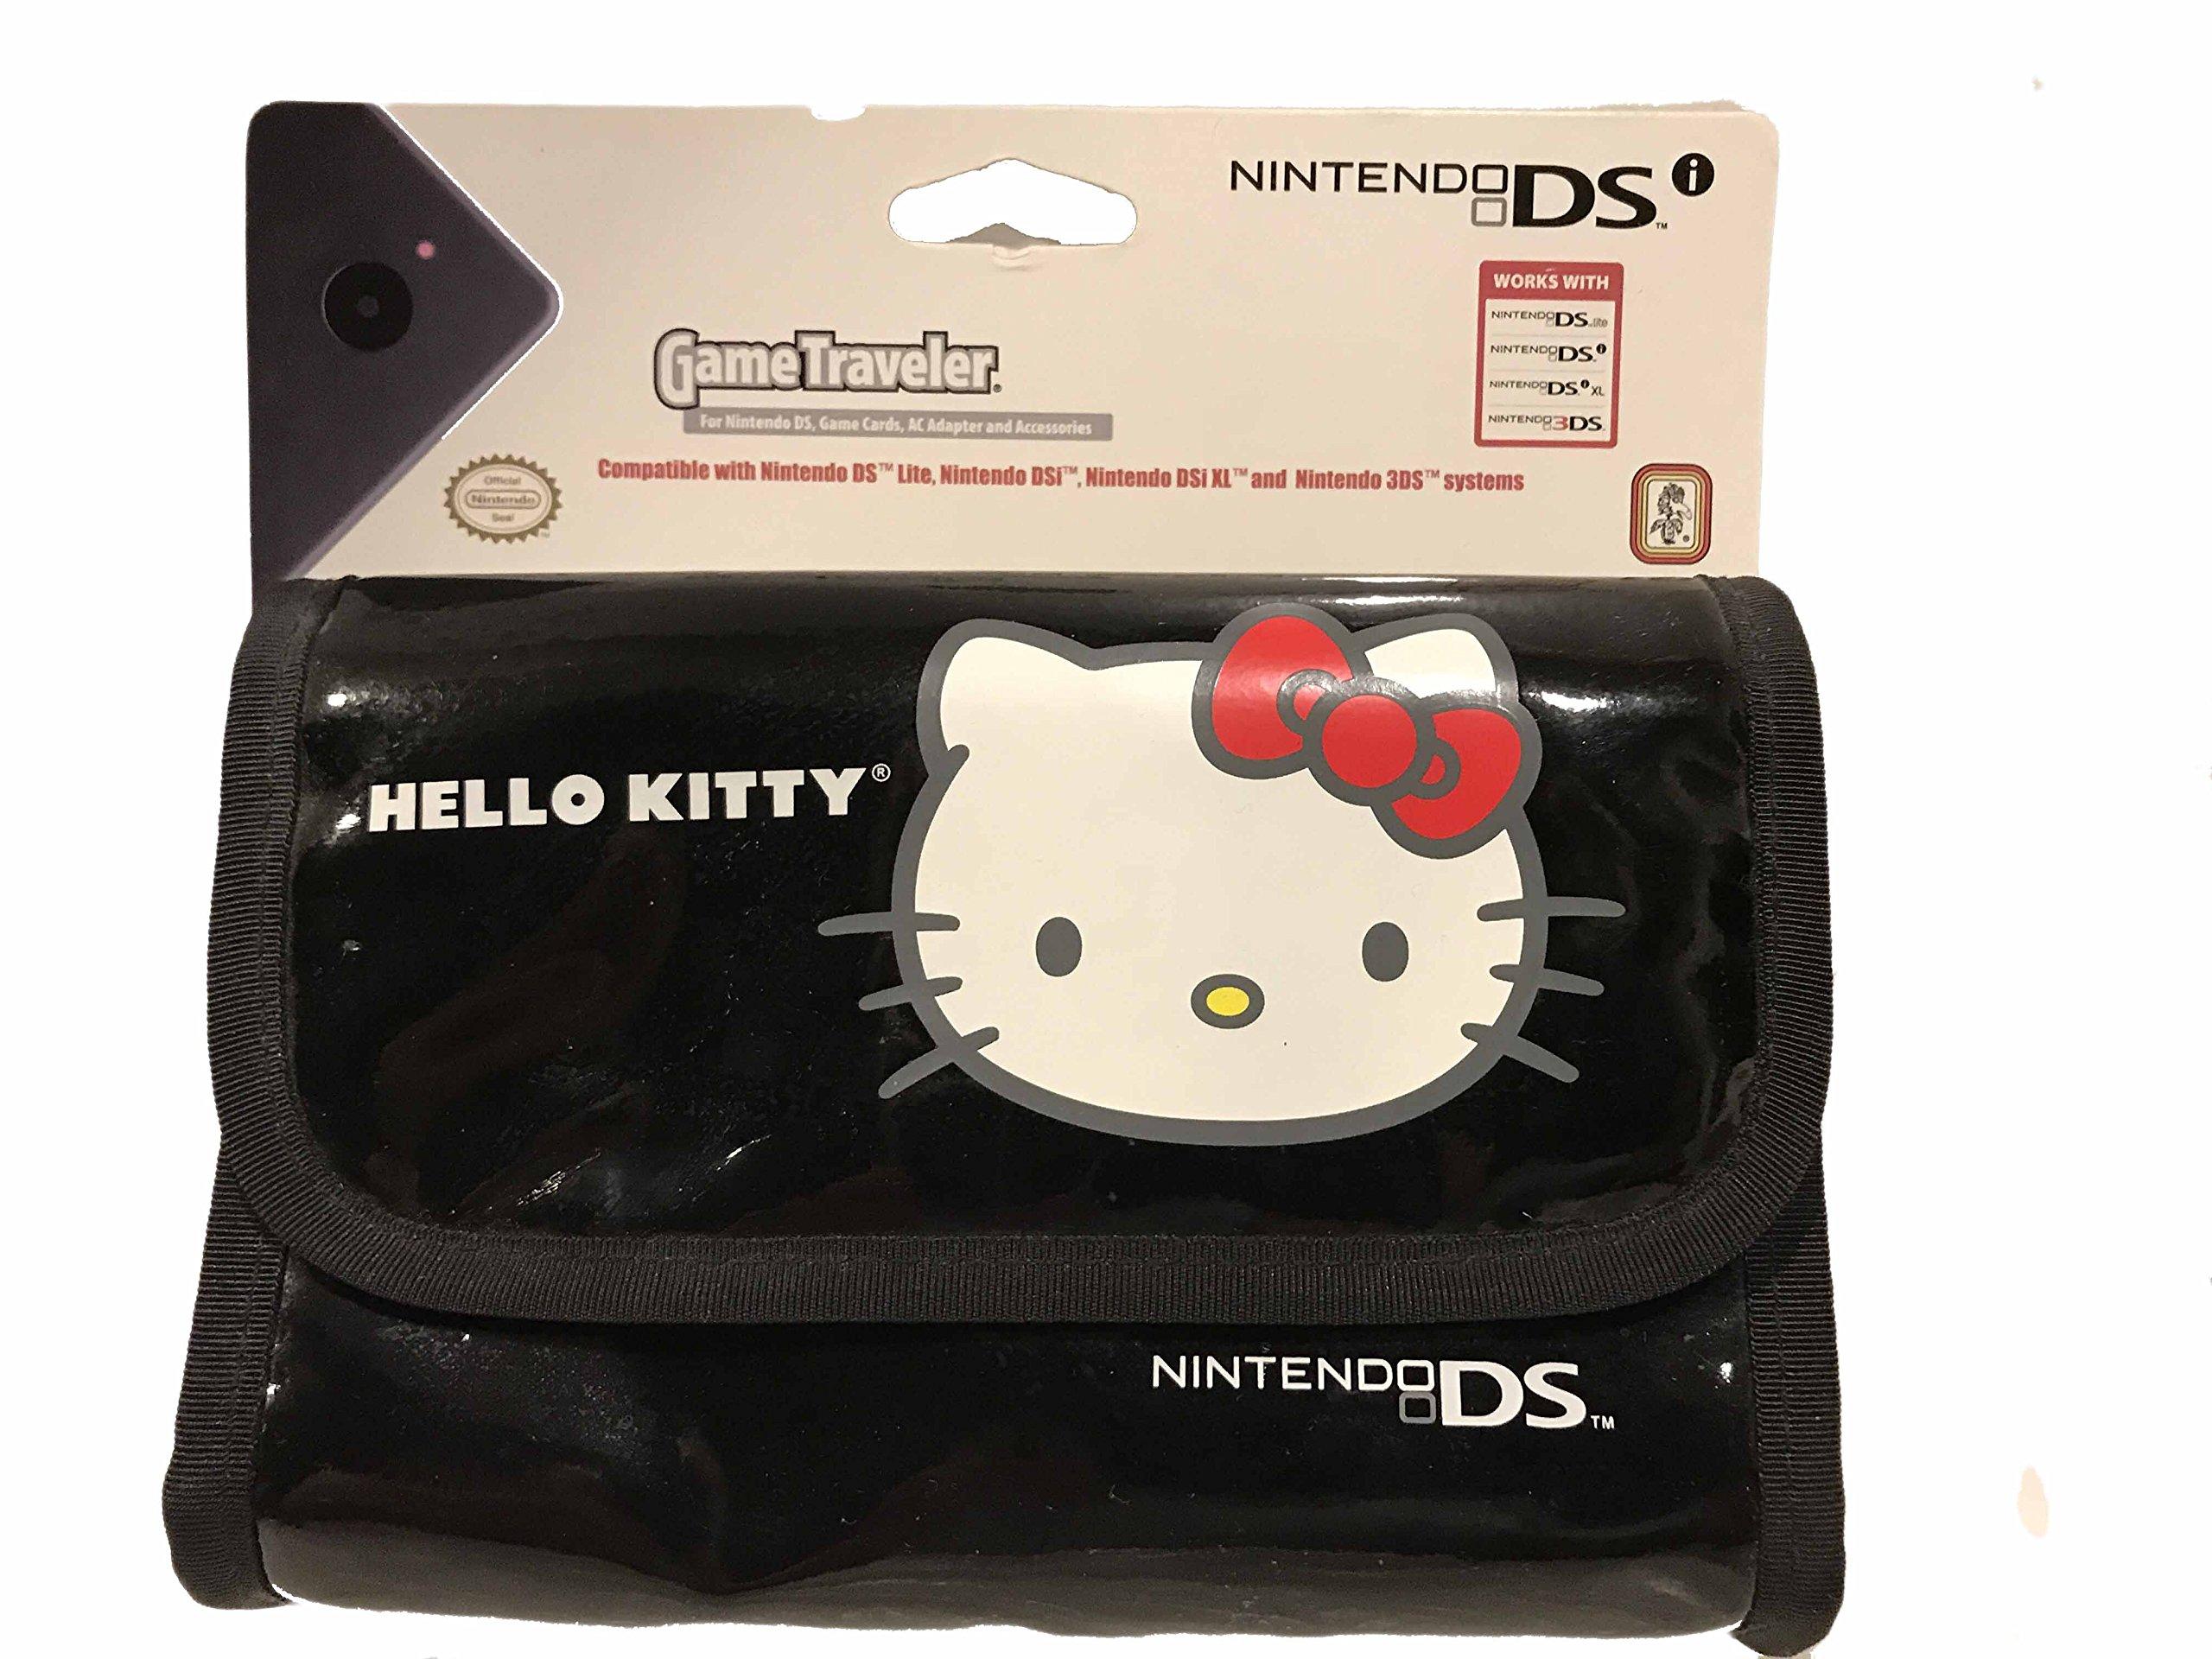 Hello Kitty Game Traveler Case for Nintendo 3DS, 3DS XL, 3DSi, DSi XL Systems